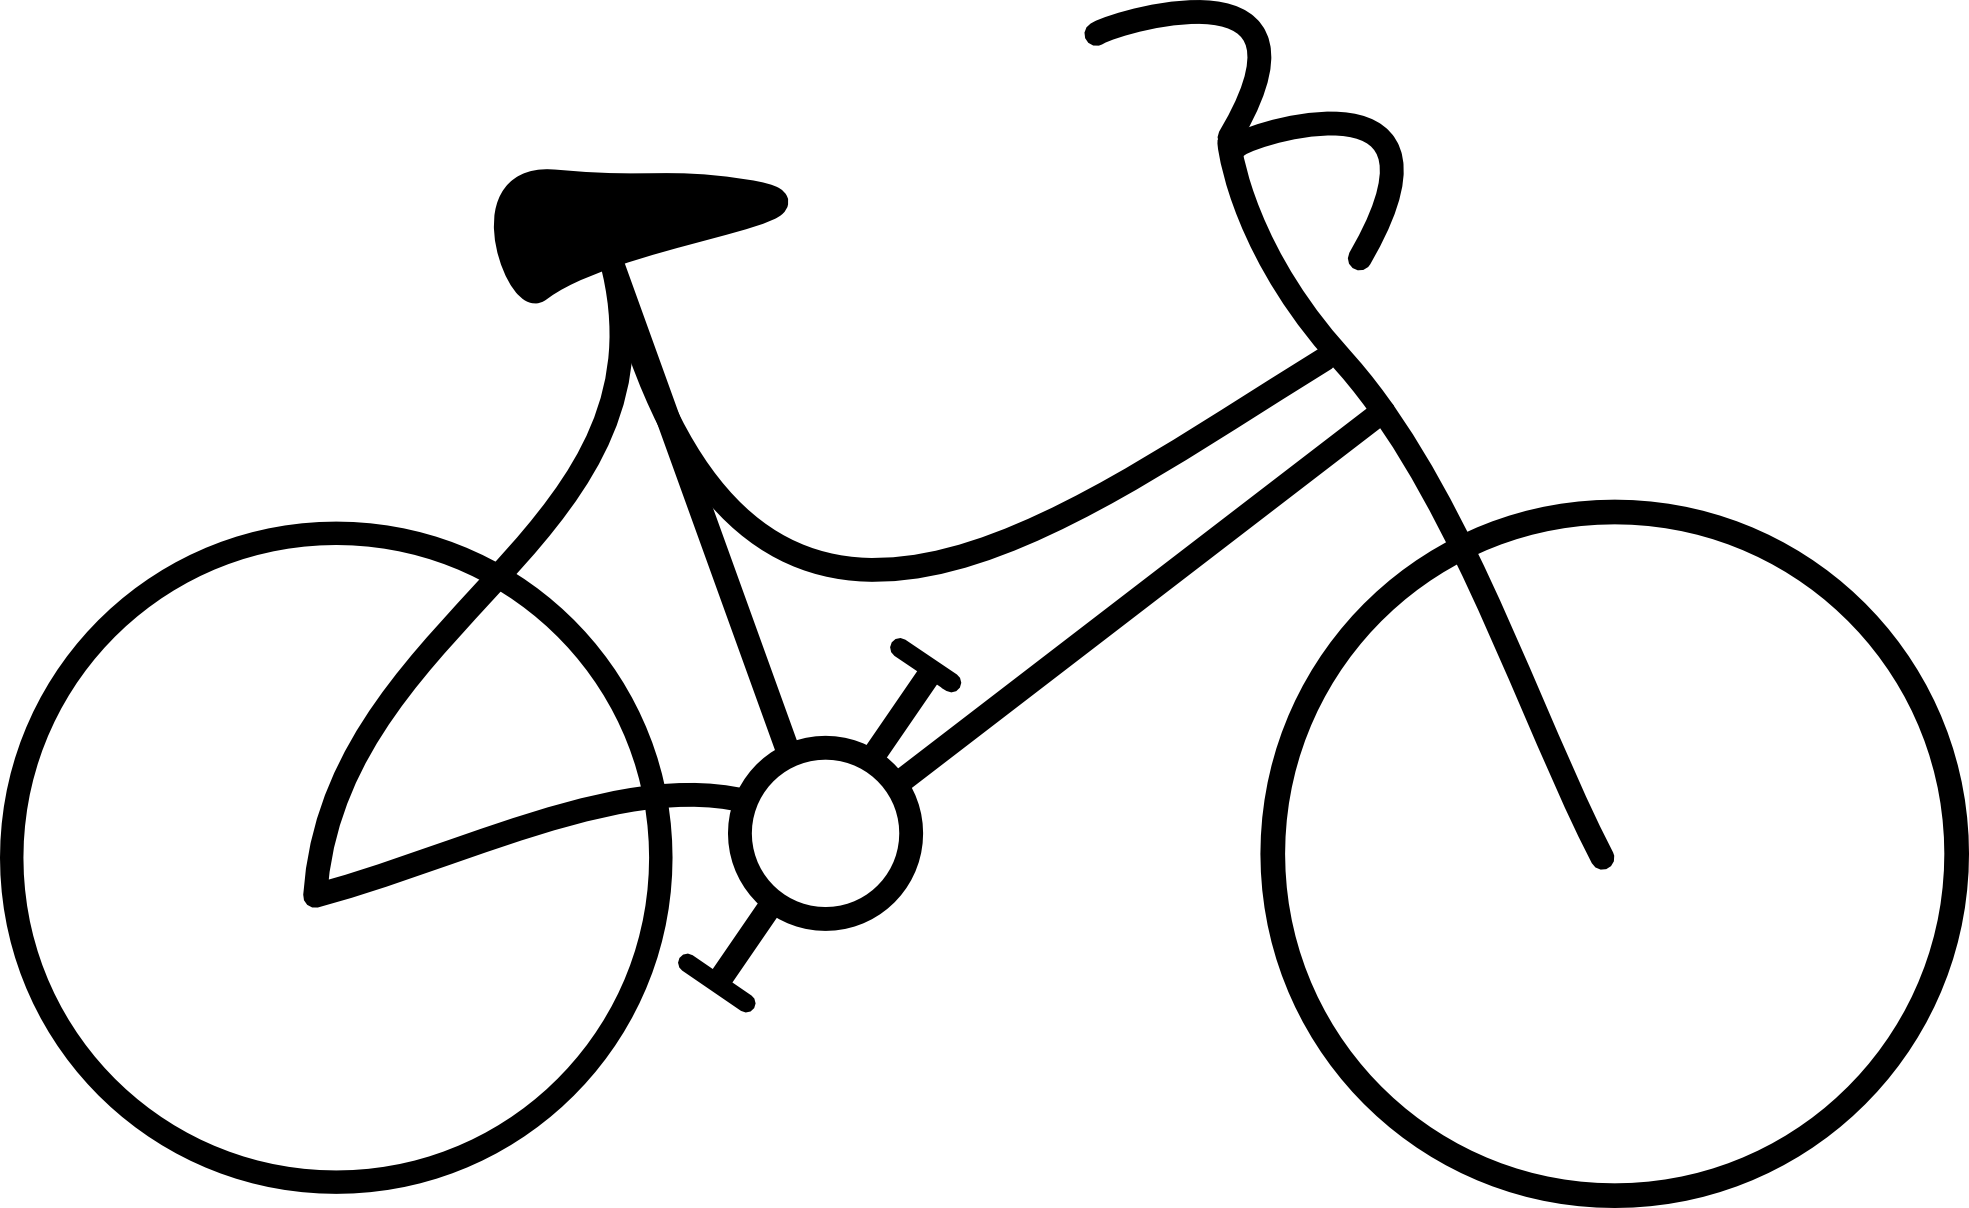 Simple Line Clip Art : Bike clipart black and white panda free